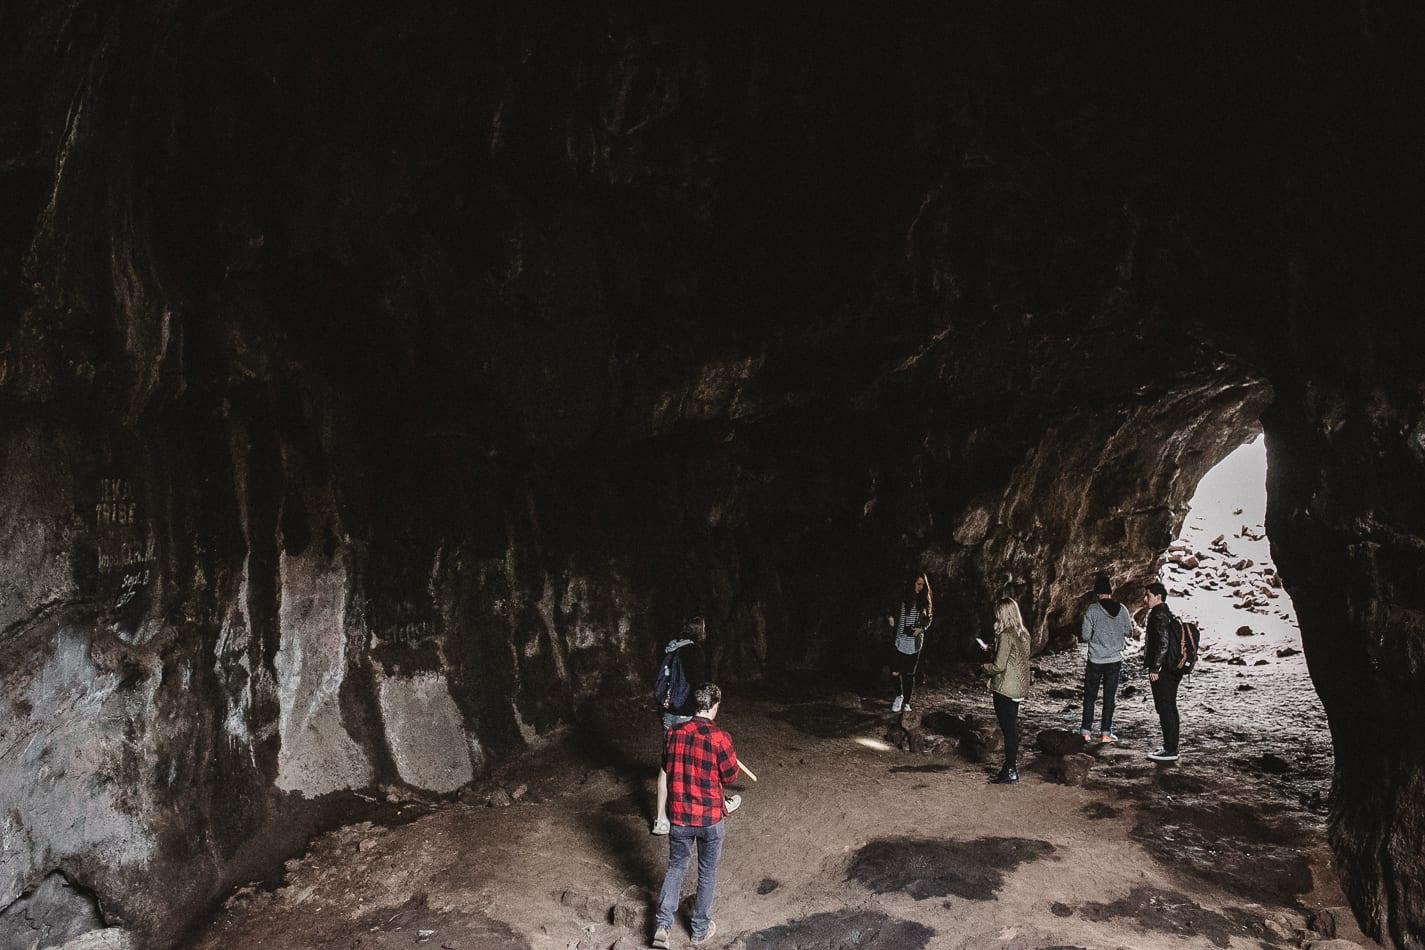 pluto-cave-mount-shasta-lifestyle-portrati-photo-19